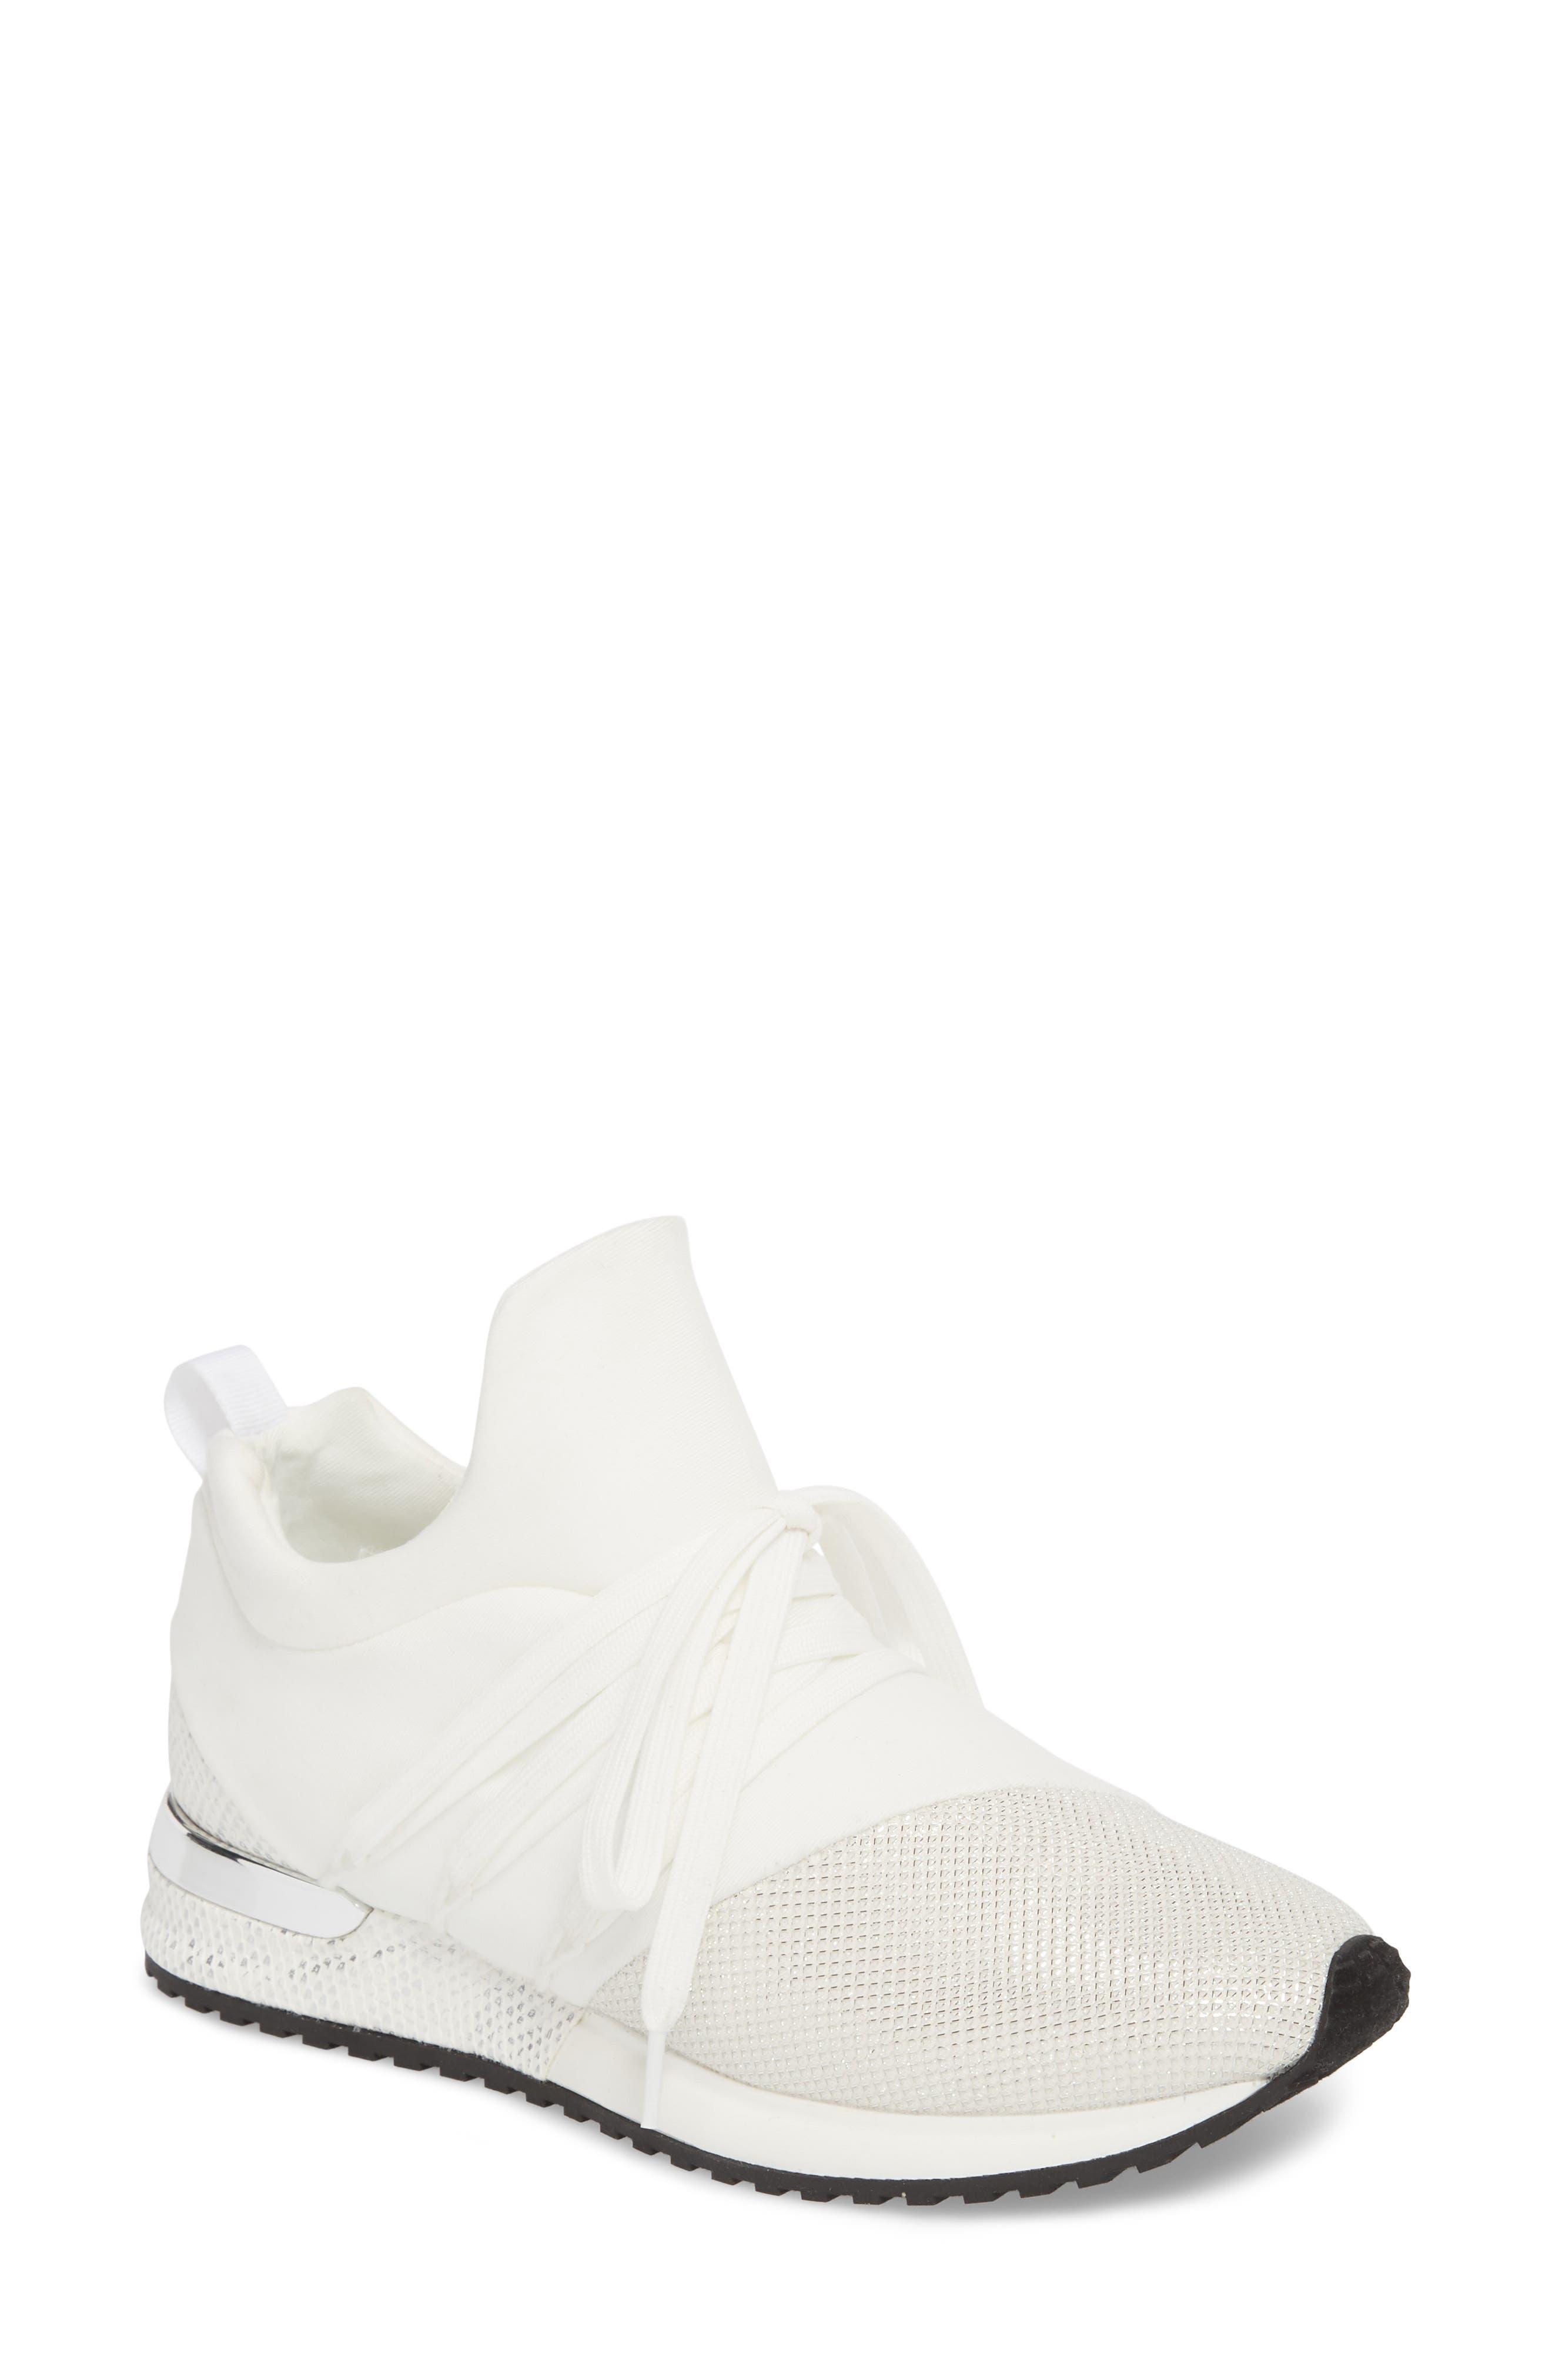 Jslides Zorro Sneaker, White